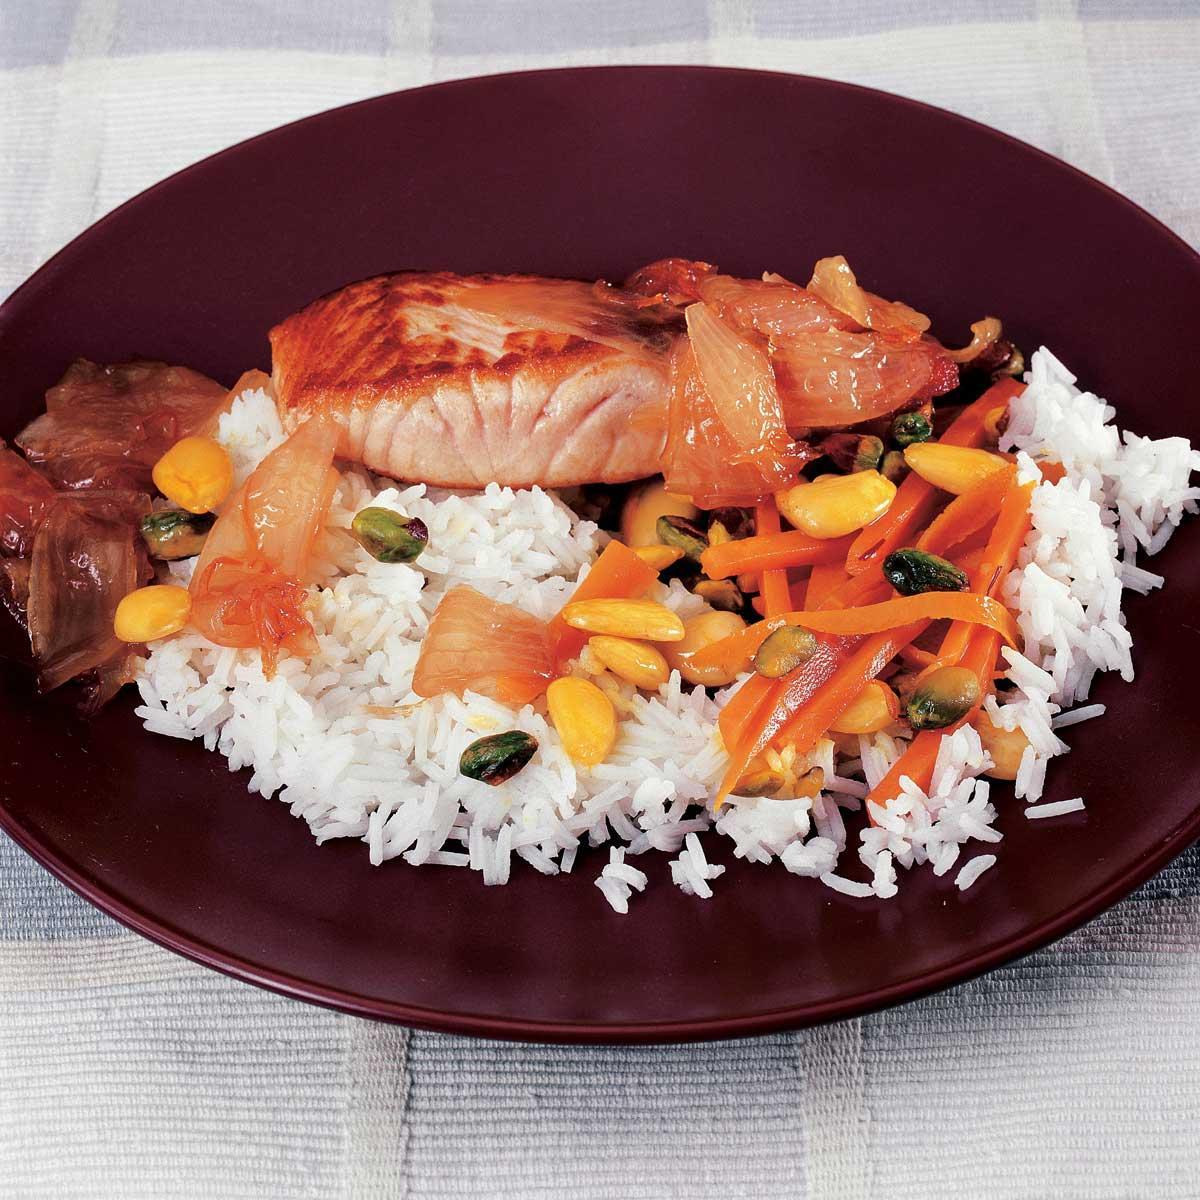 Recette shirin cuisine madame figaro - Madame figaro cuisine ...